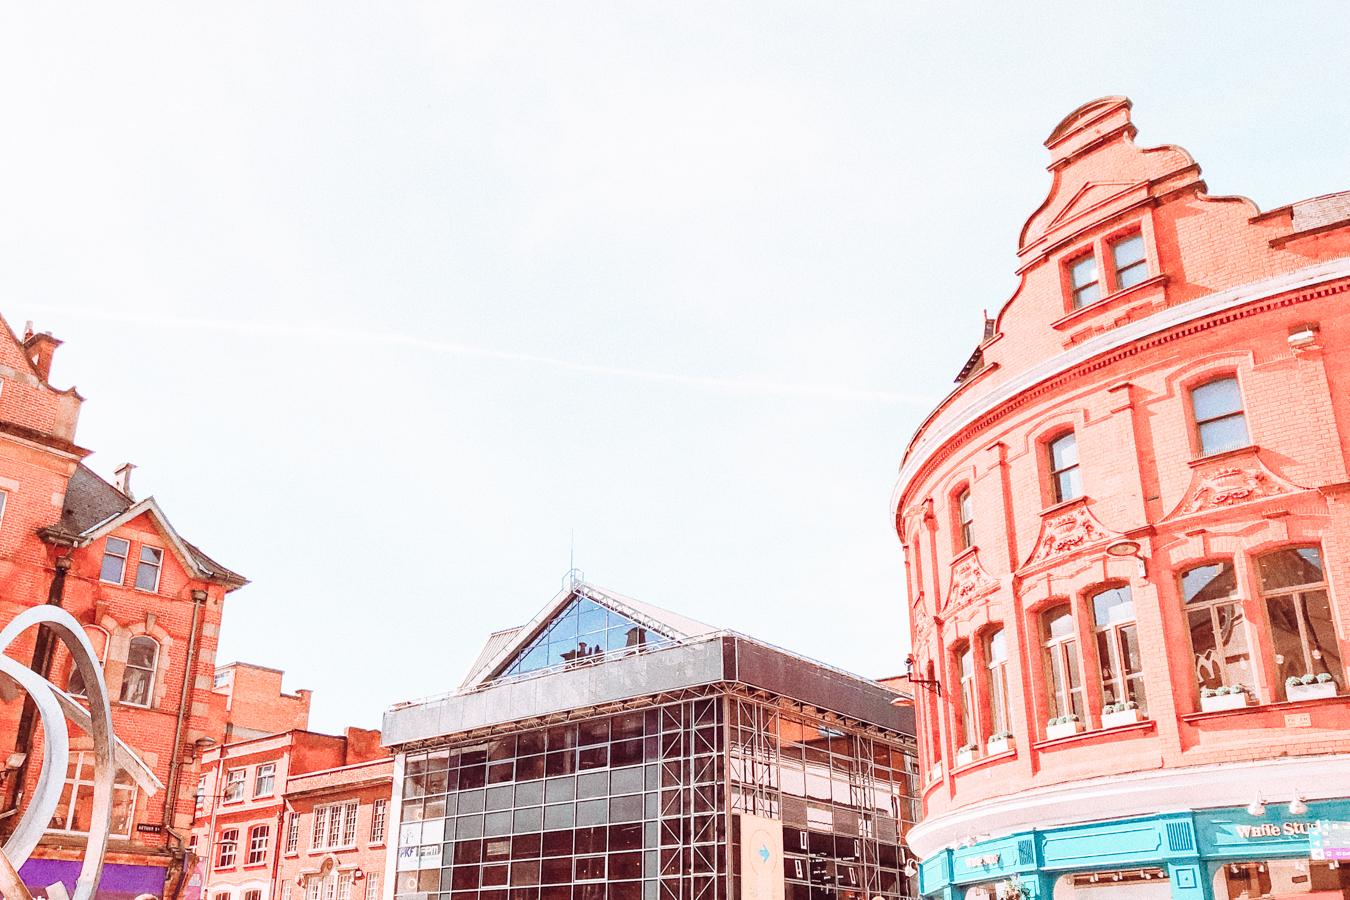 Buildings in Belfast